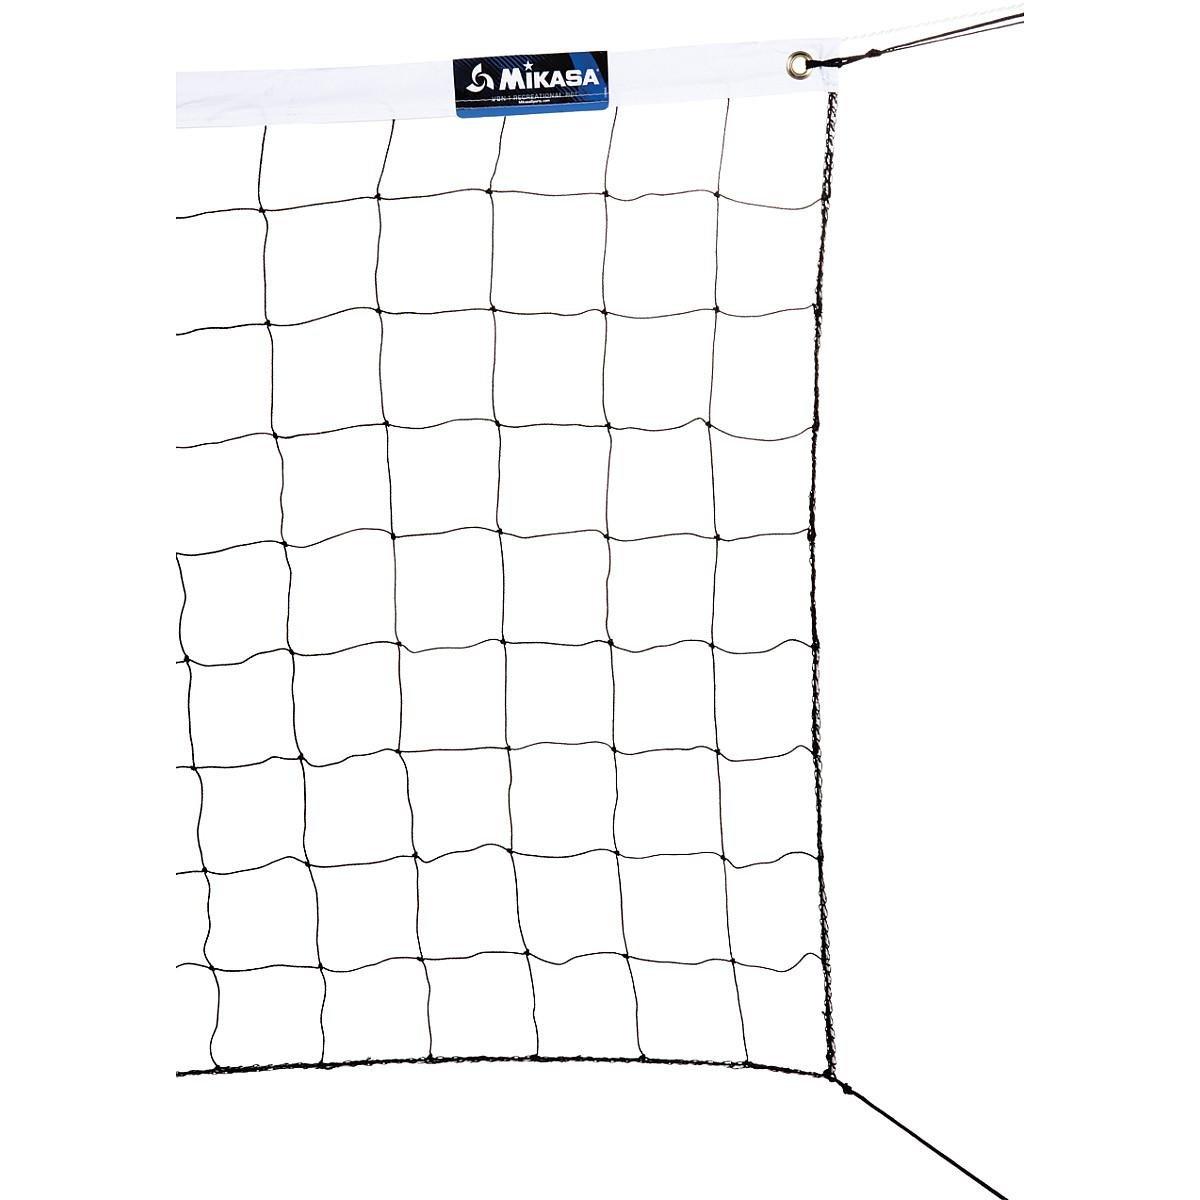 Mikasa VBN-1 Recreational Volleyball Net